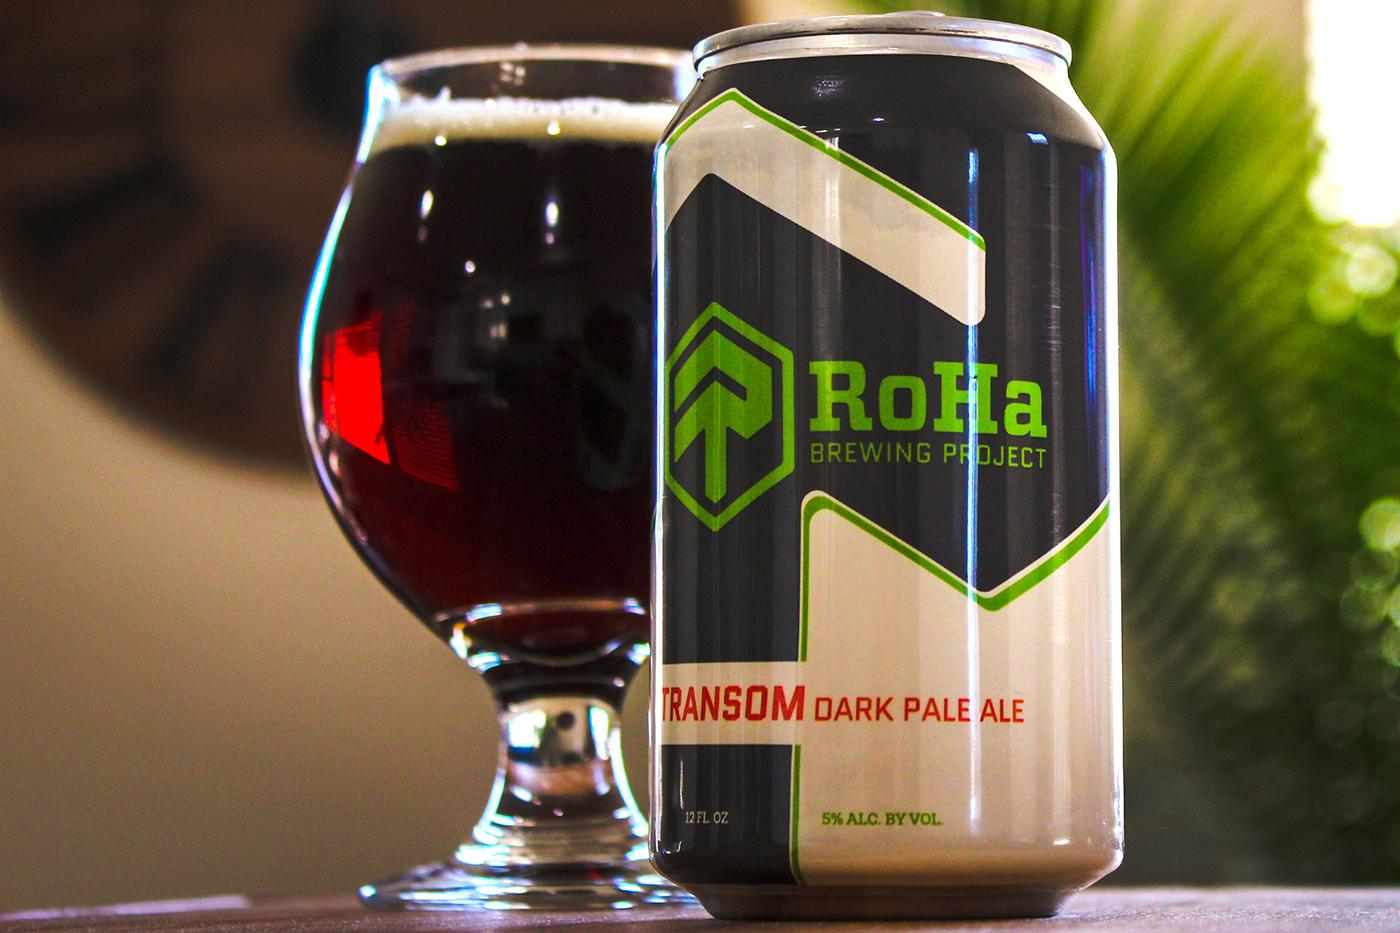 Beer Review Roha Brewing Project Transom Dark Pale Ale Slug Magazine